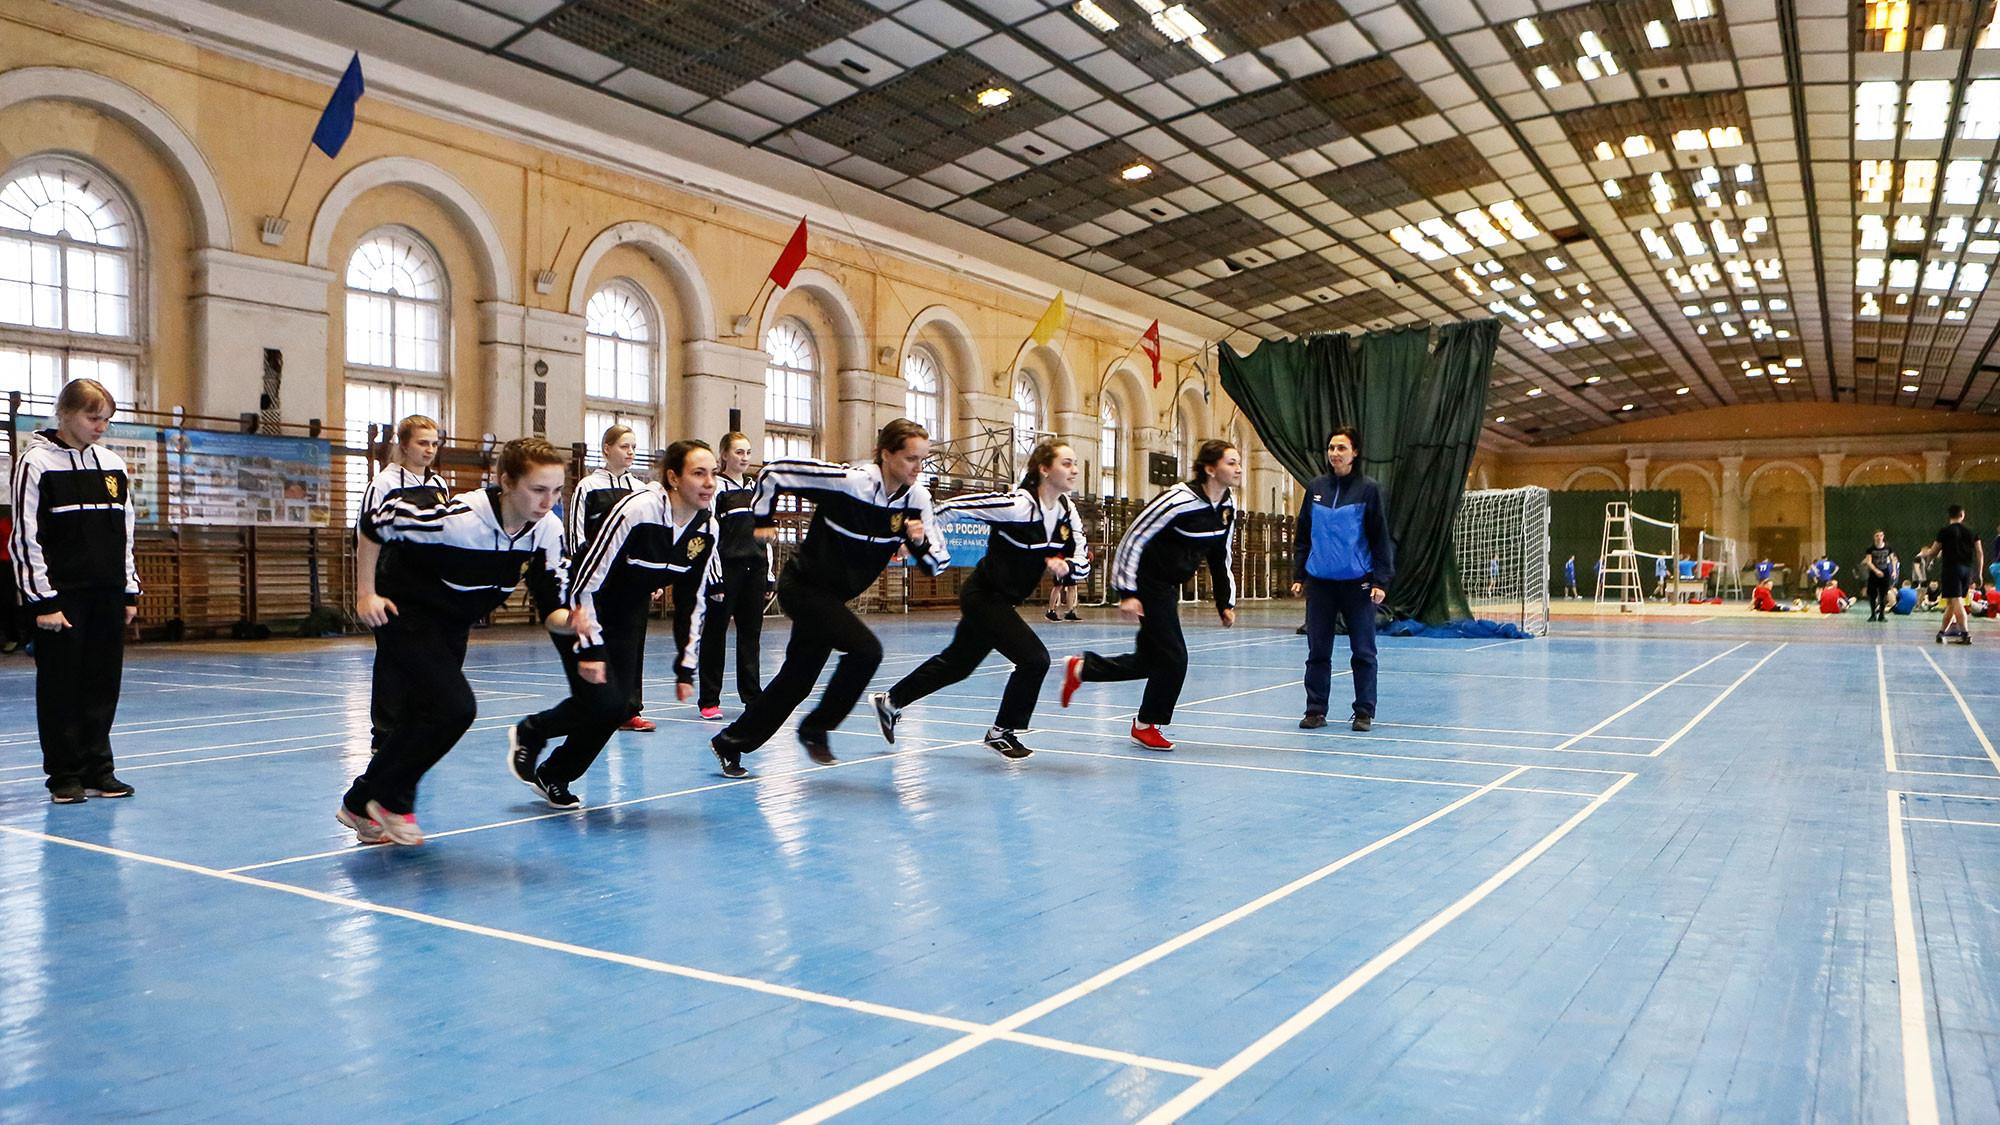 <p><span>Фото: &copy; РИА Новости / Михаил Киреев</span></p>